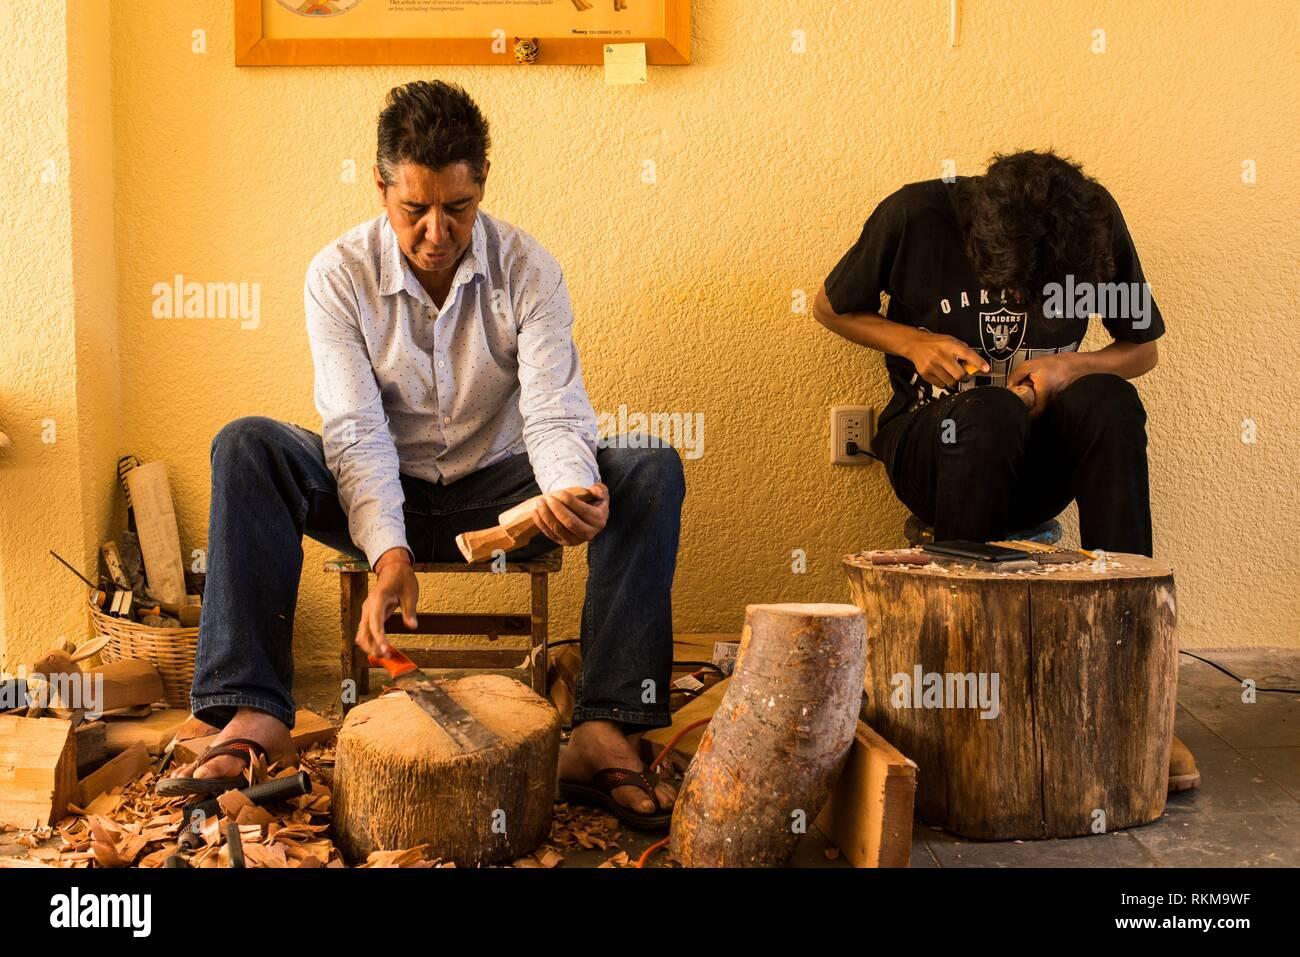 Two men sculpting alebrijes, folk art sculpture in Arrazola, Oaxaca, Mexico. - Stock Image